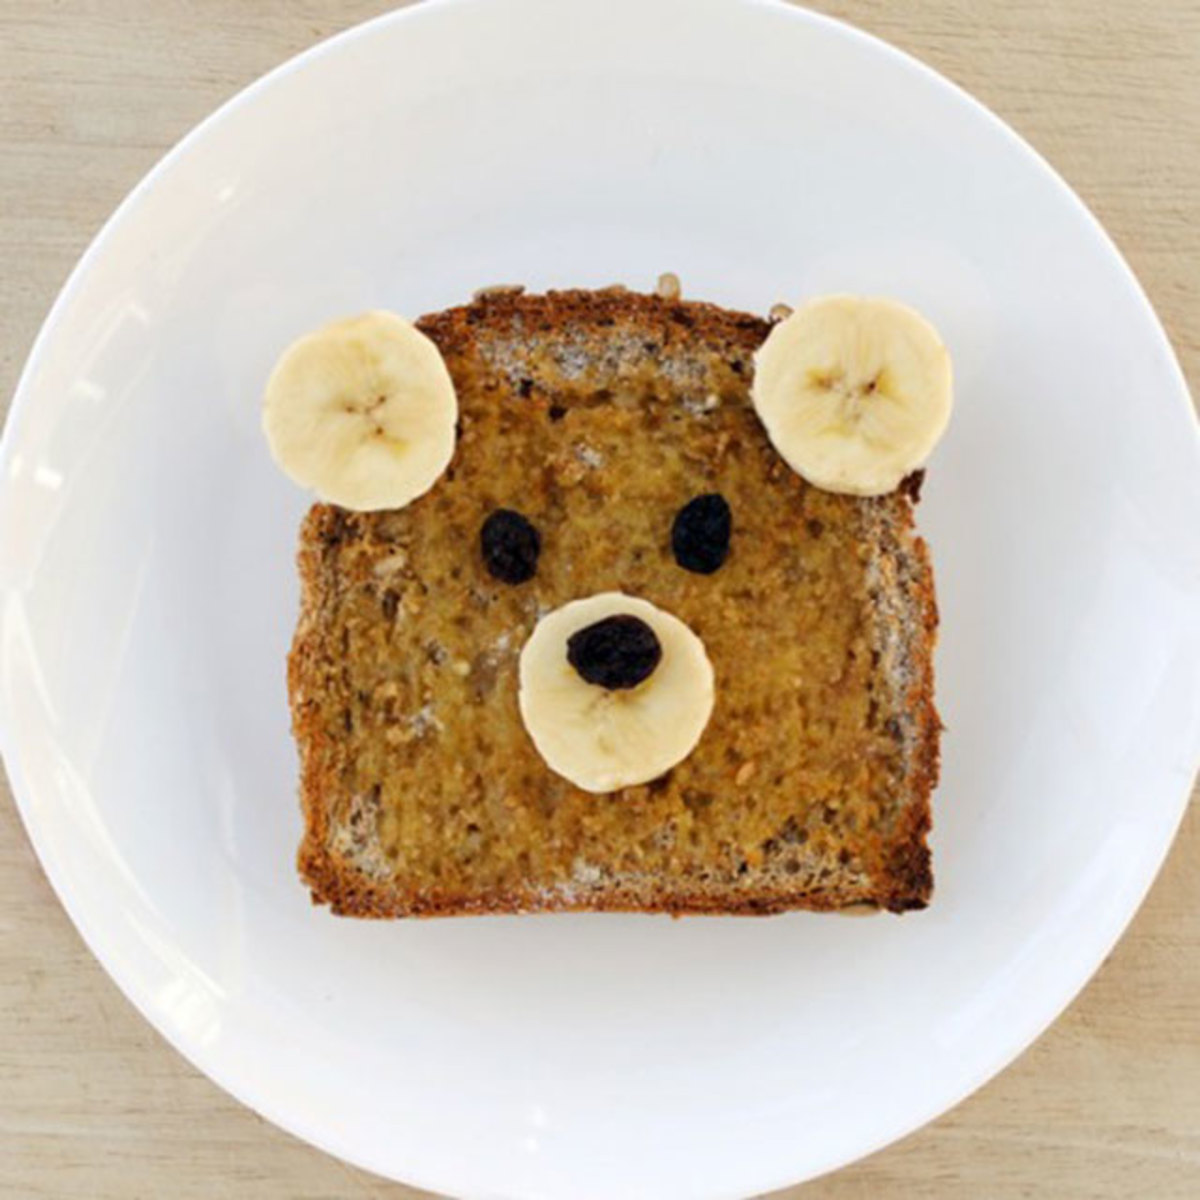 Peanut Butter and Banana Sandwich Bear